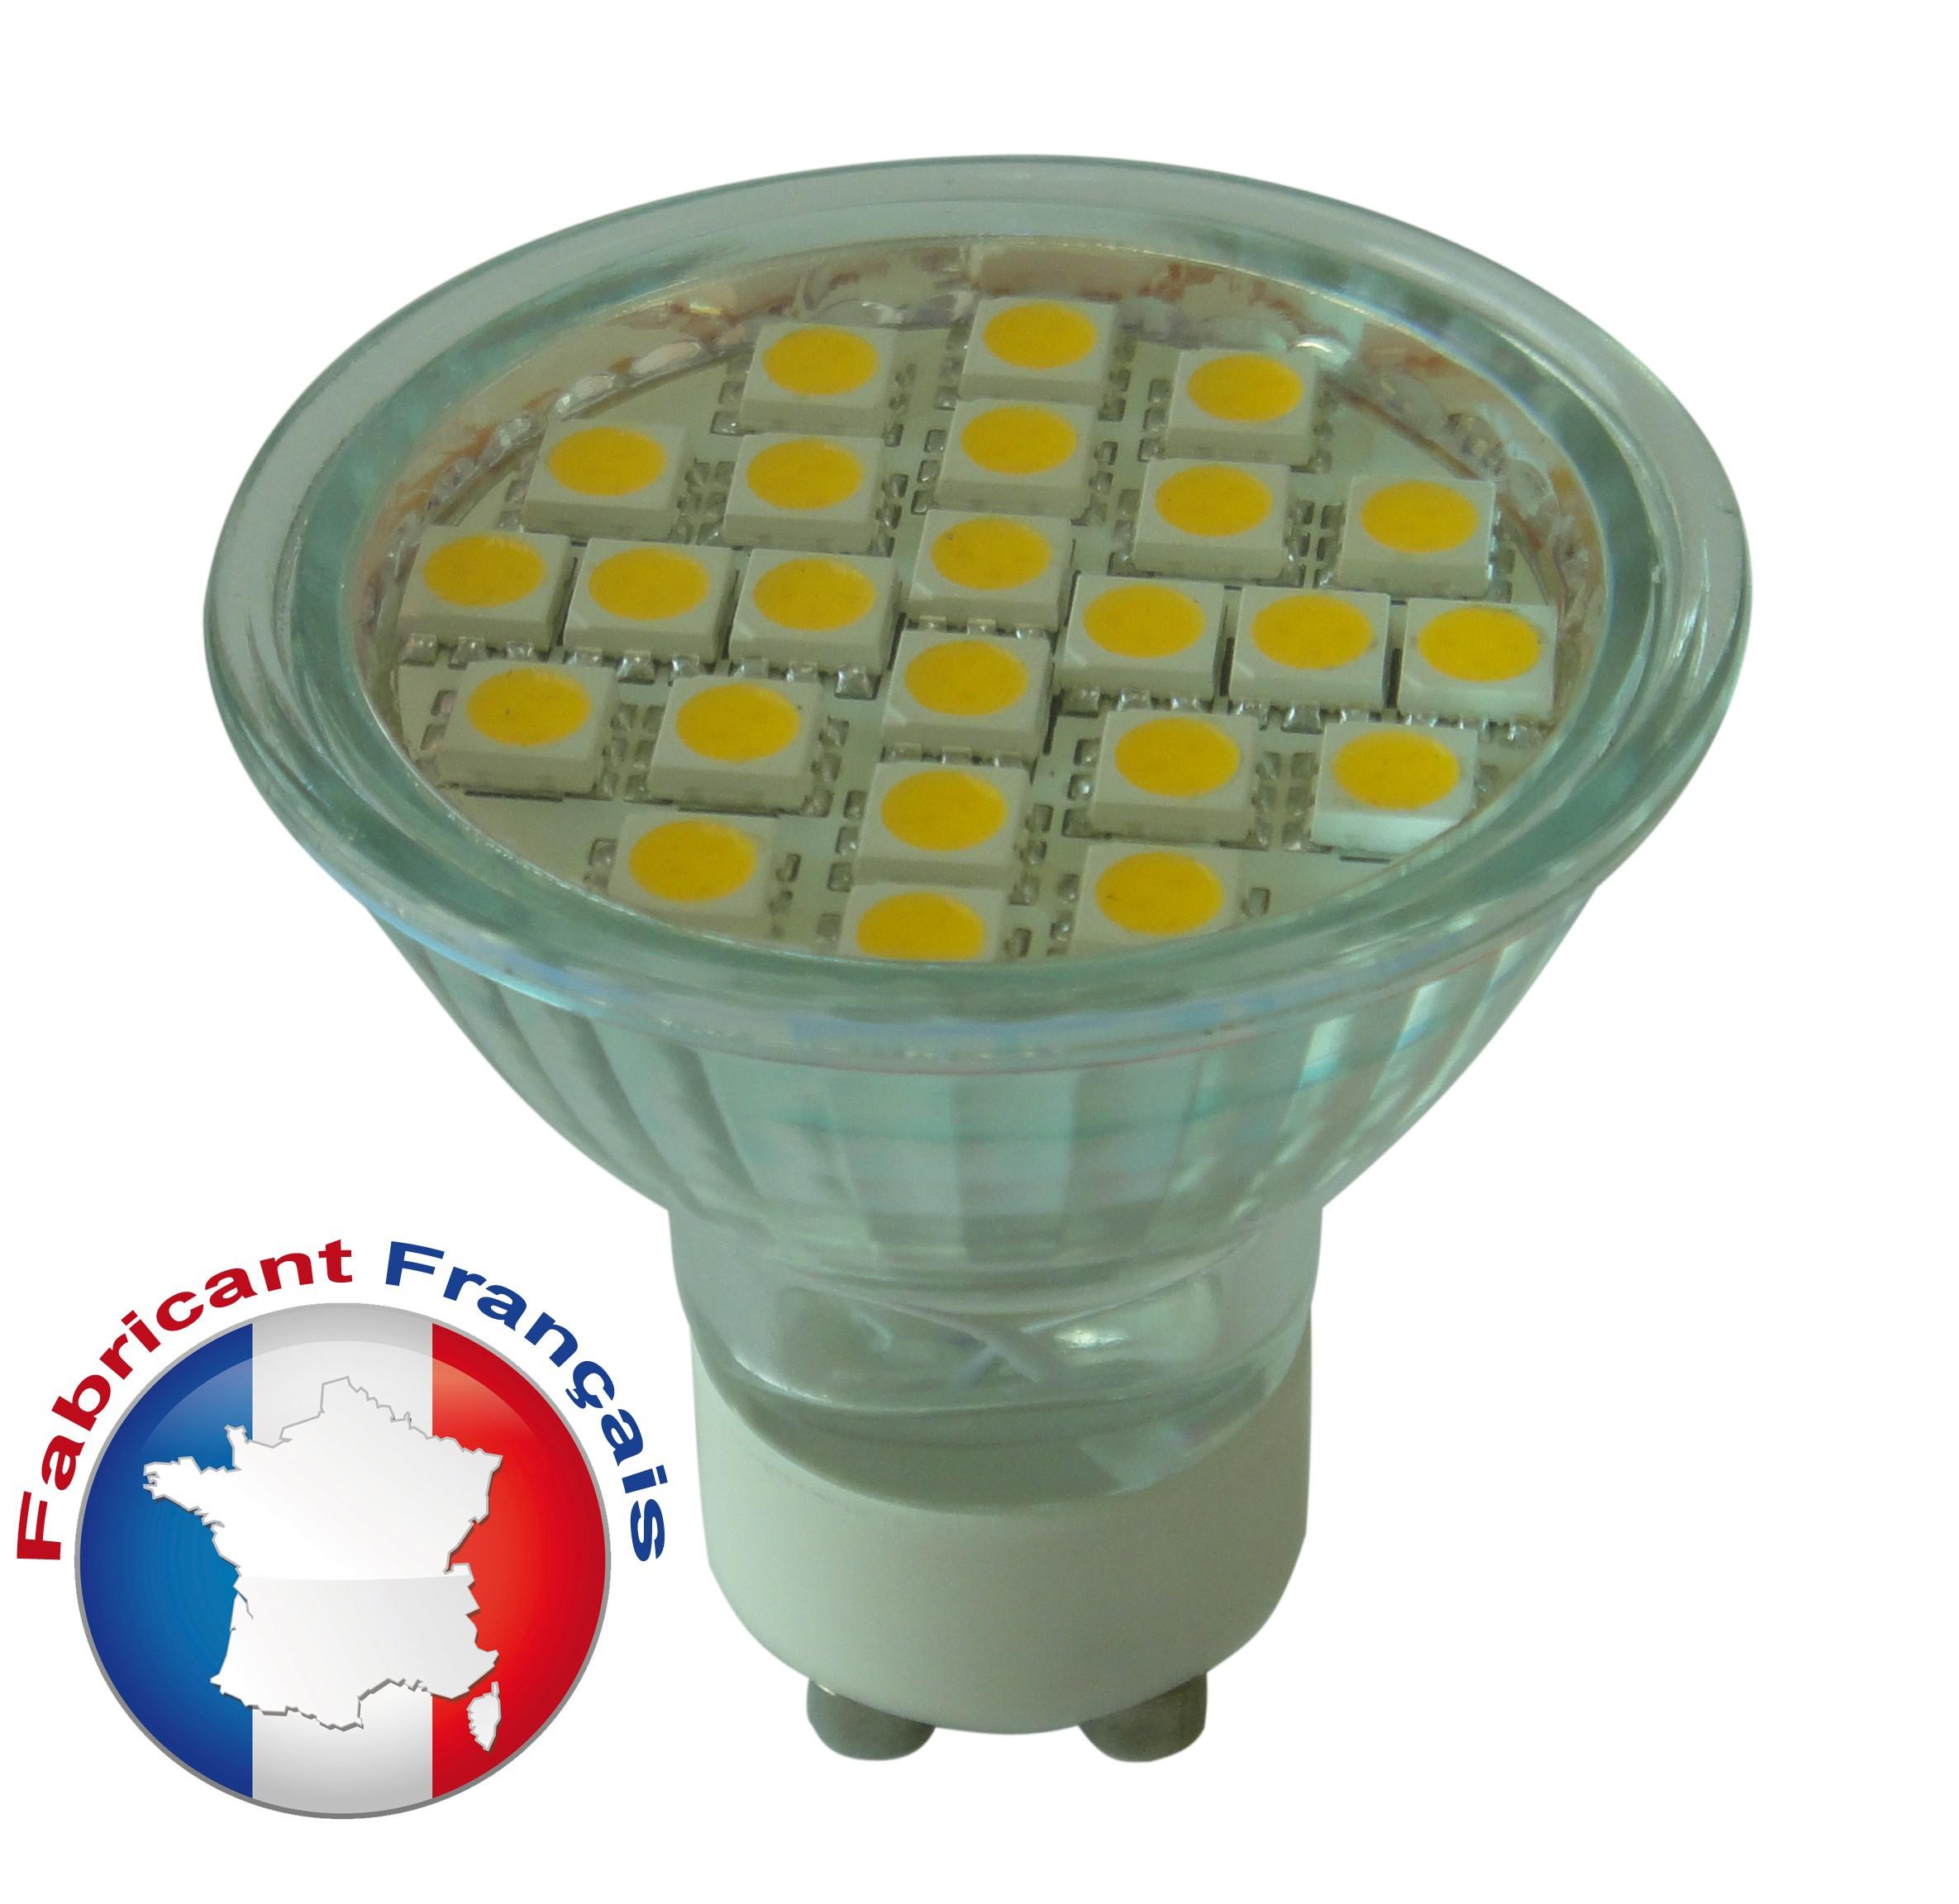 Ampoule Spot LED GU10 4,5W - 220V - Blanc chaud